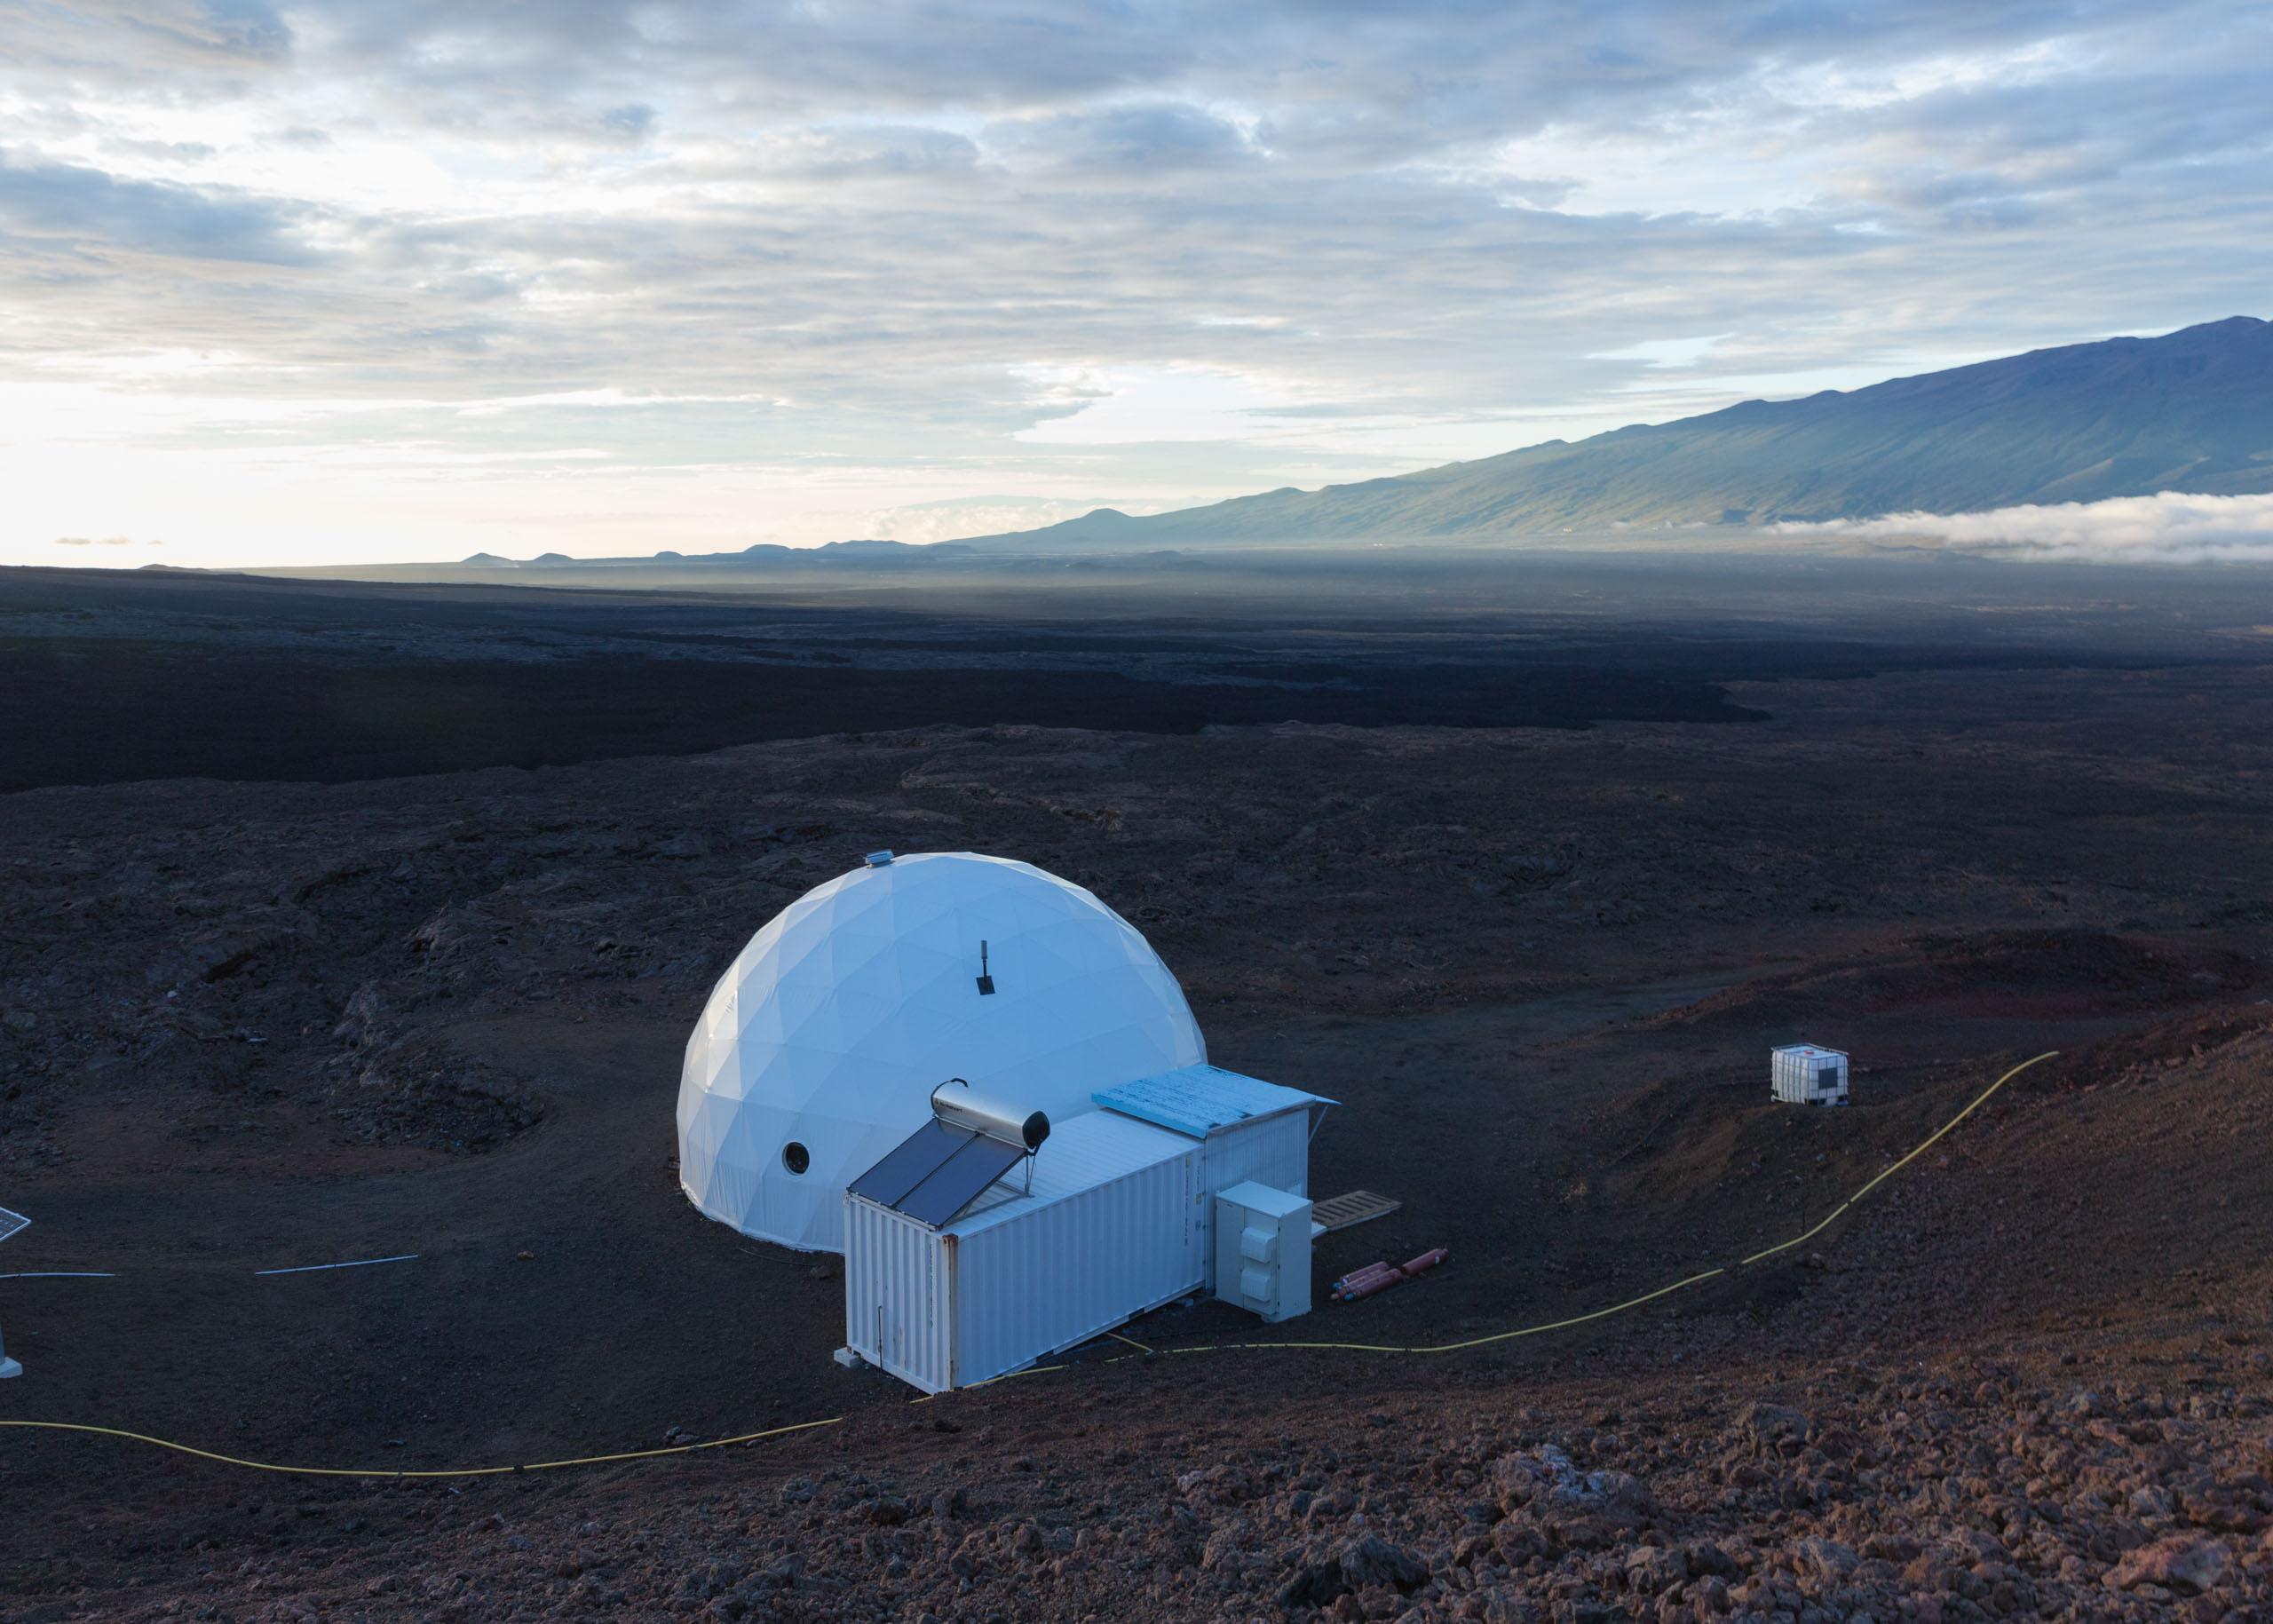 The HI-SEAS Mars simulation habitat on the Mauna Loa volcano in Hawaii.